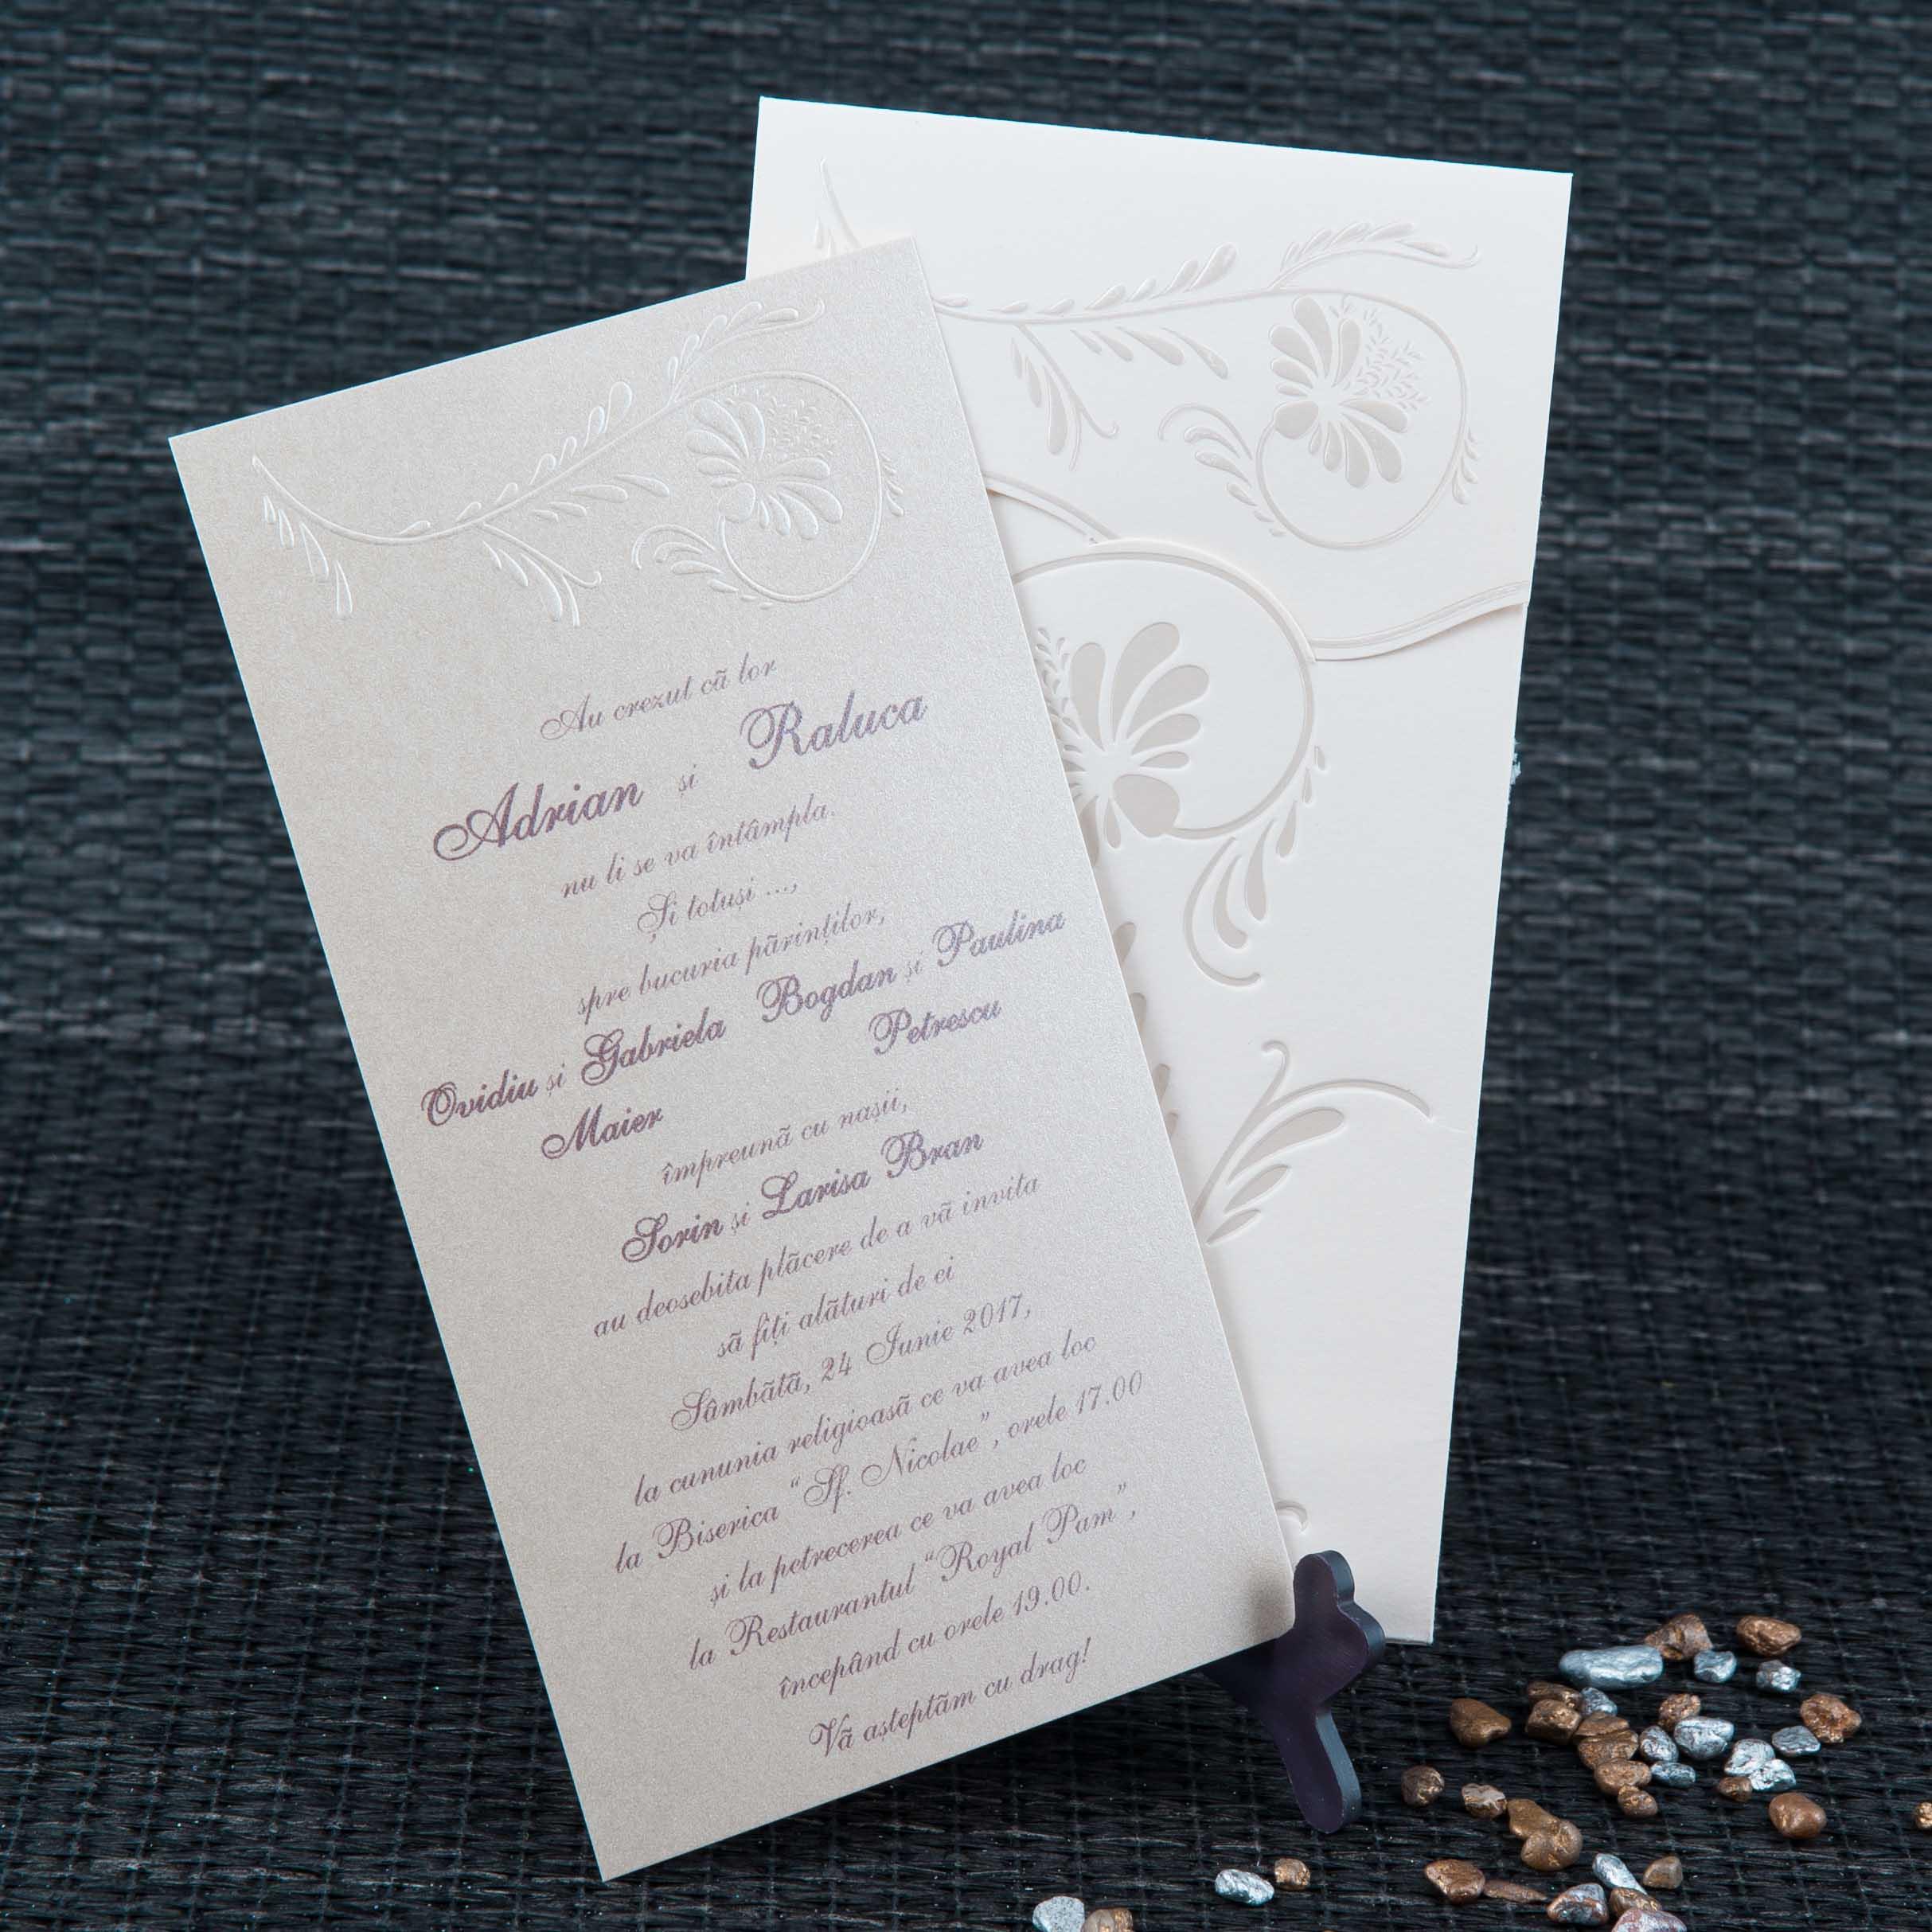 1084 Invitatii Nunta Invitatii Botez Marturii Plicuri Bani